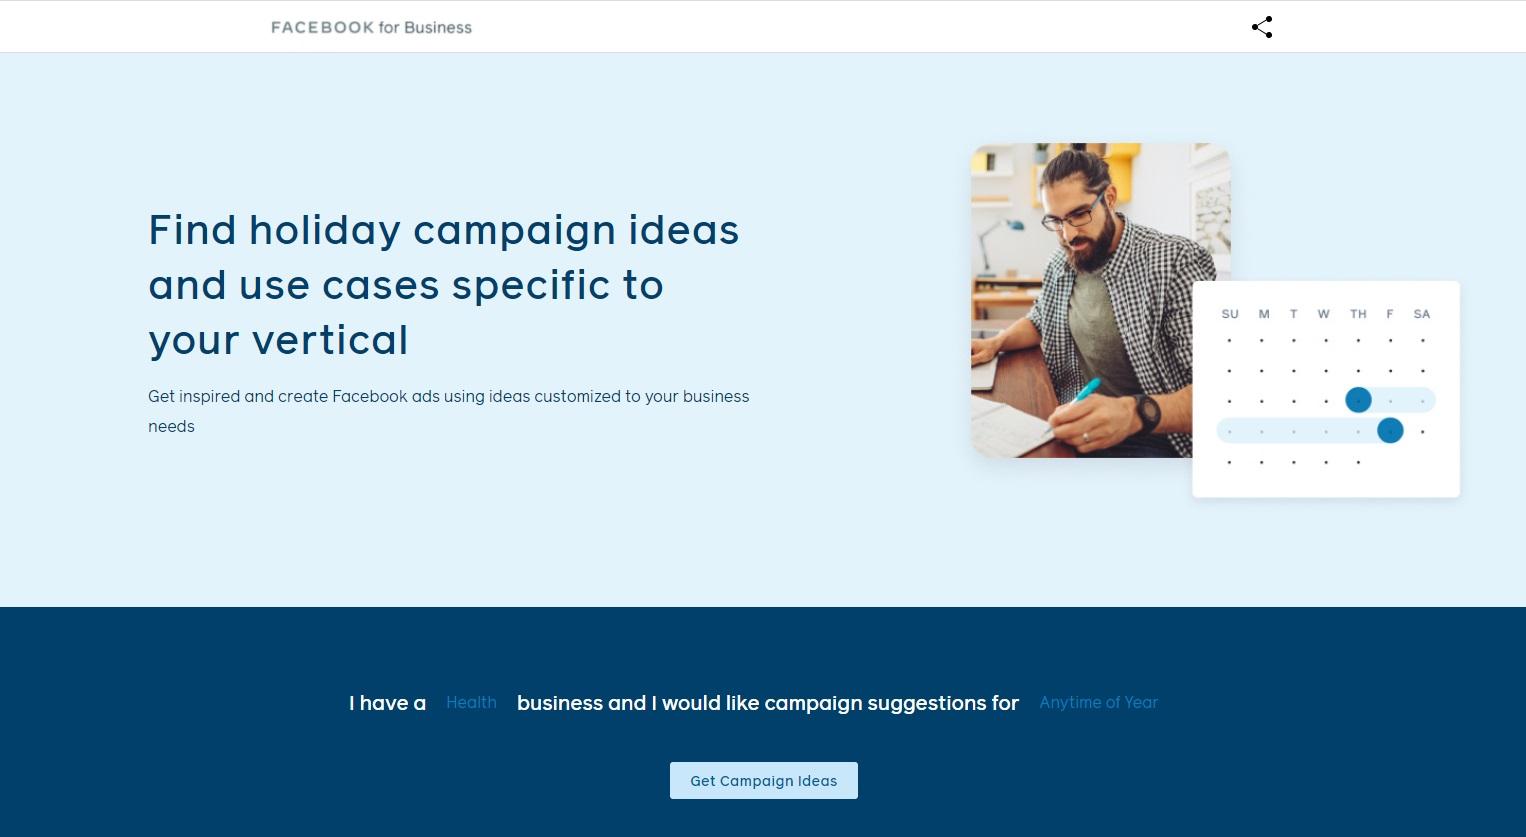 Facebook's Campaign Ideas Generator